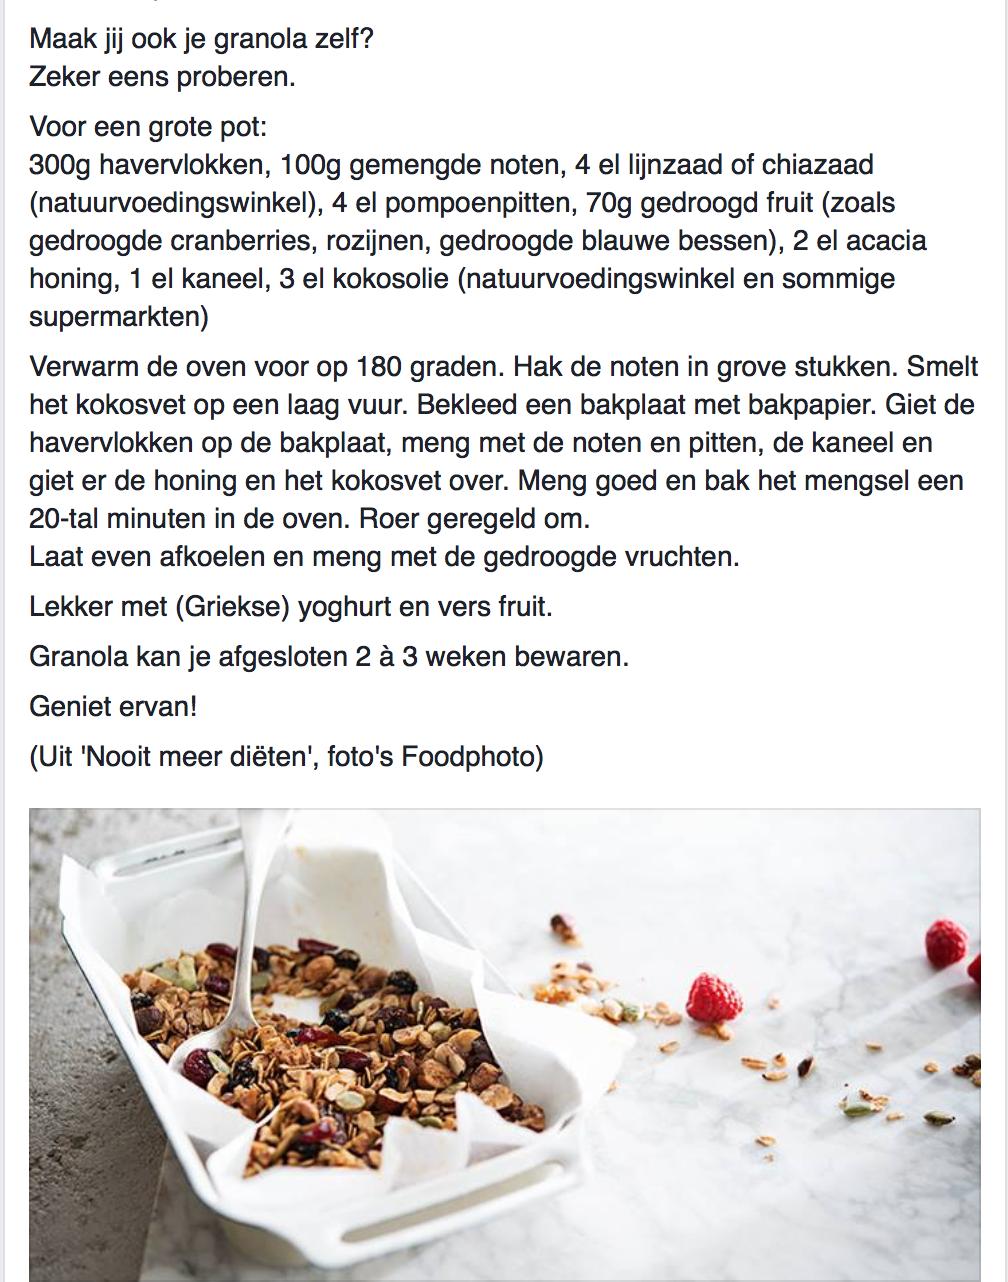 Bekend Granola door Sandra Bekkari #sandrabekkari | Healthyschmelty in #JV01